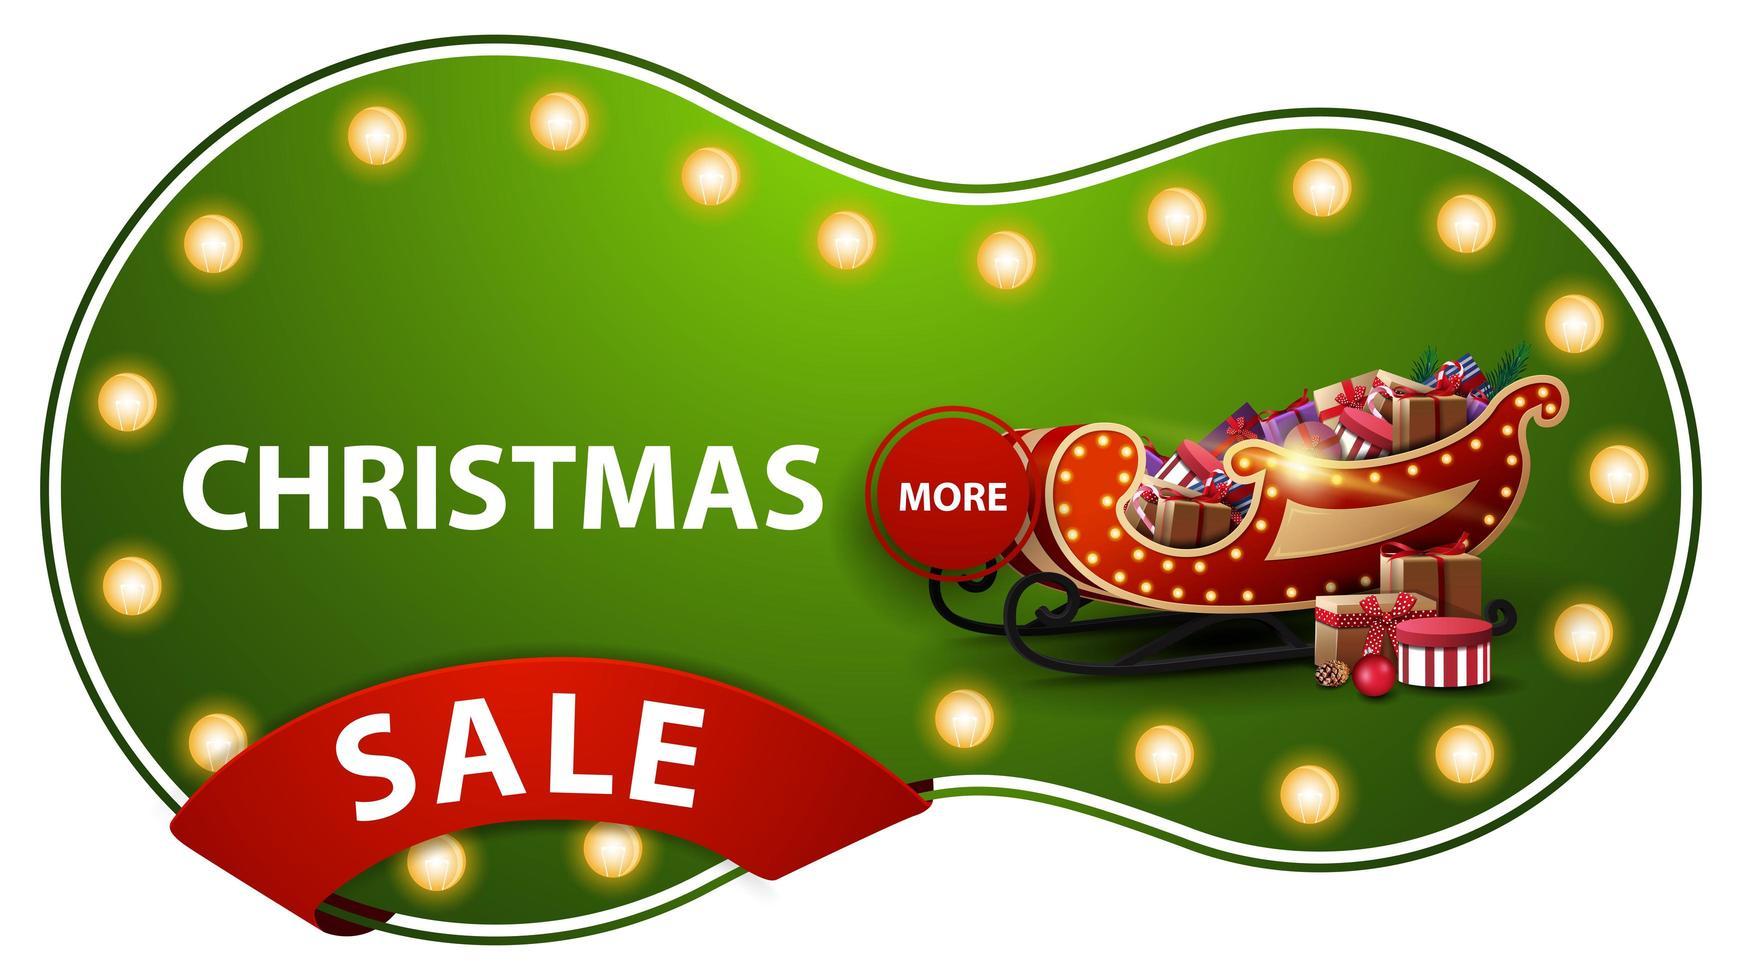 kerstuitverkoop, groene kortingsbanner met gloeilampen, rood lint en santaslee met cadeautjes vector